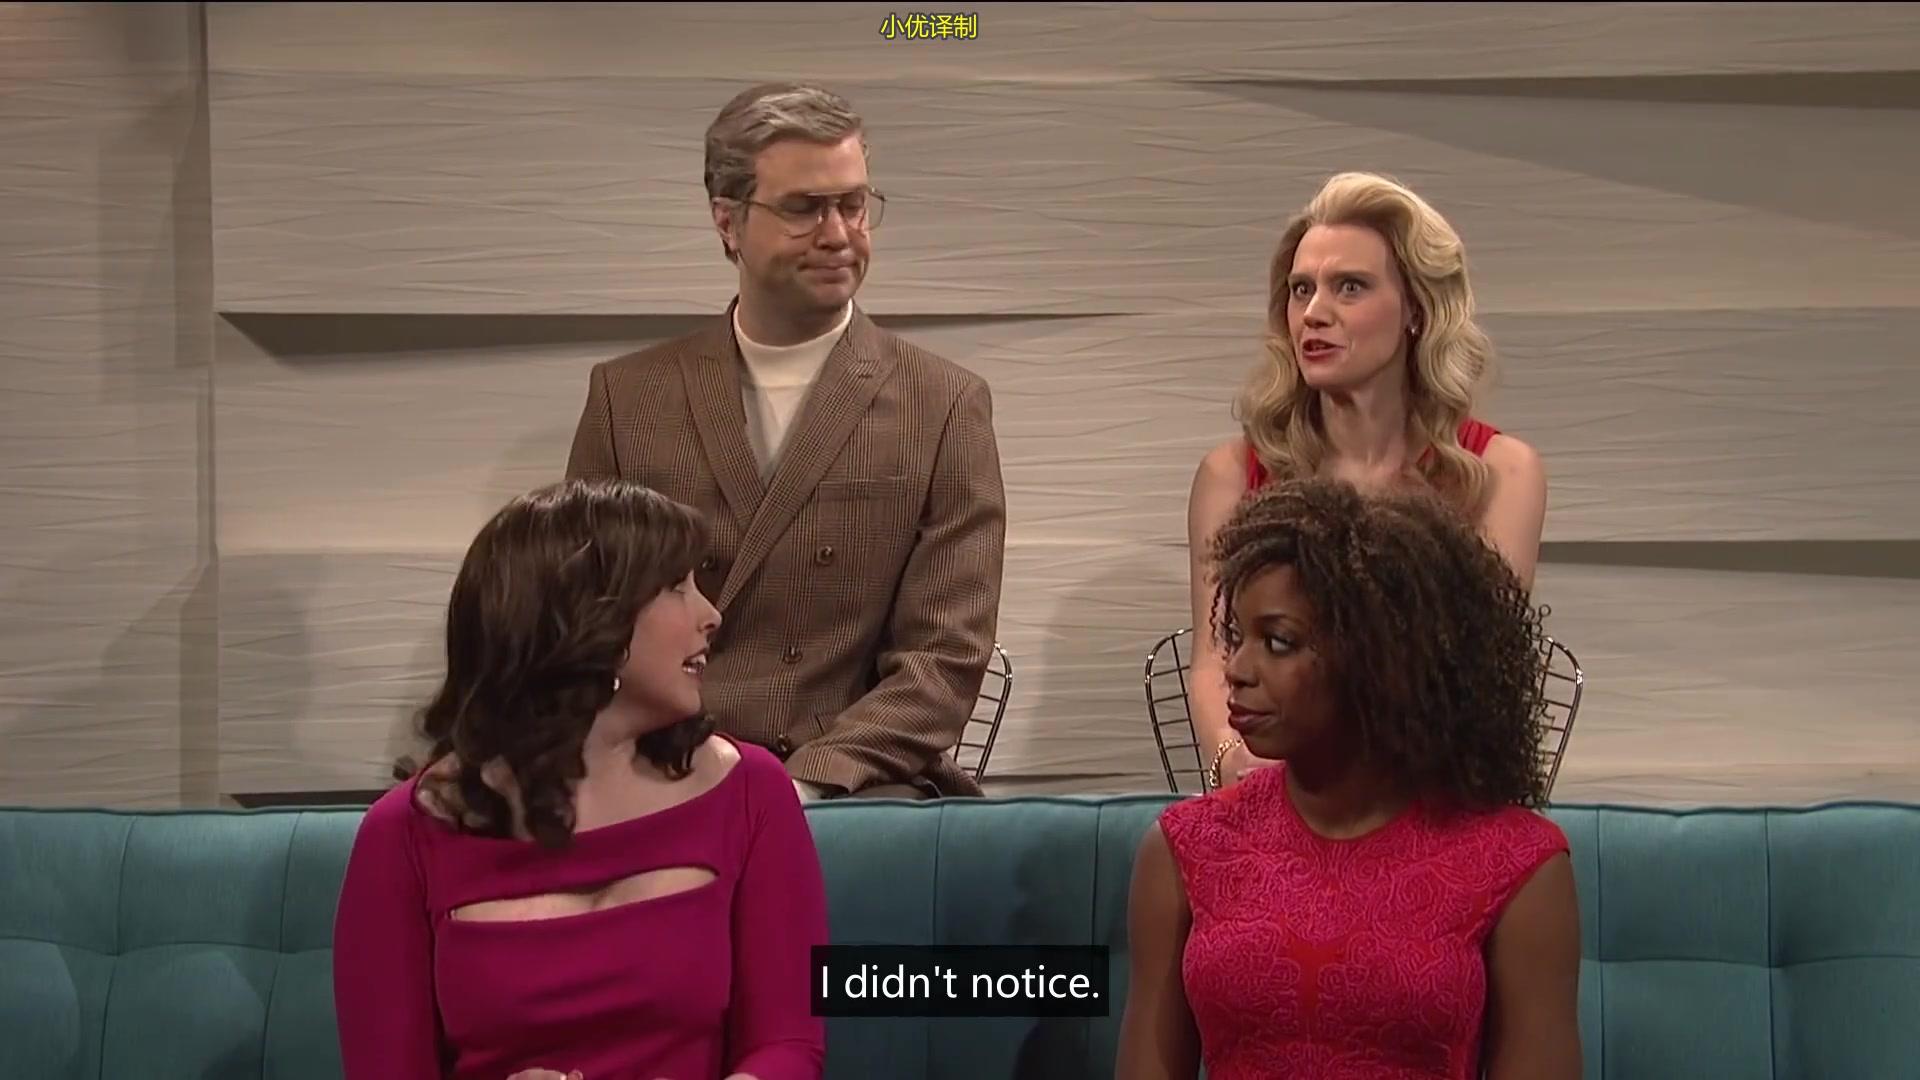 【SNL 全英】论背景音乐的重要性